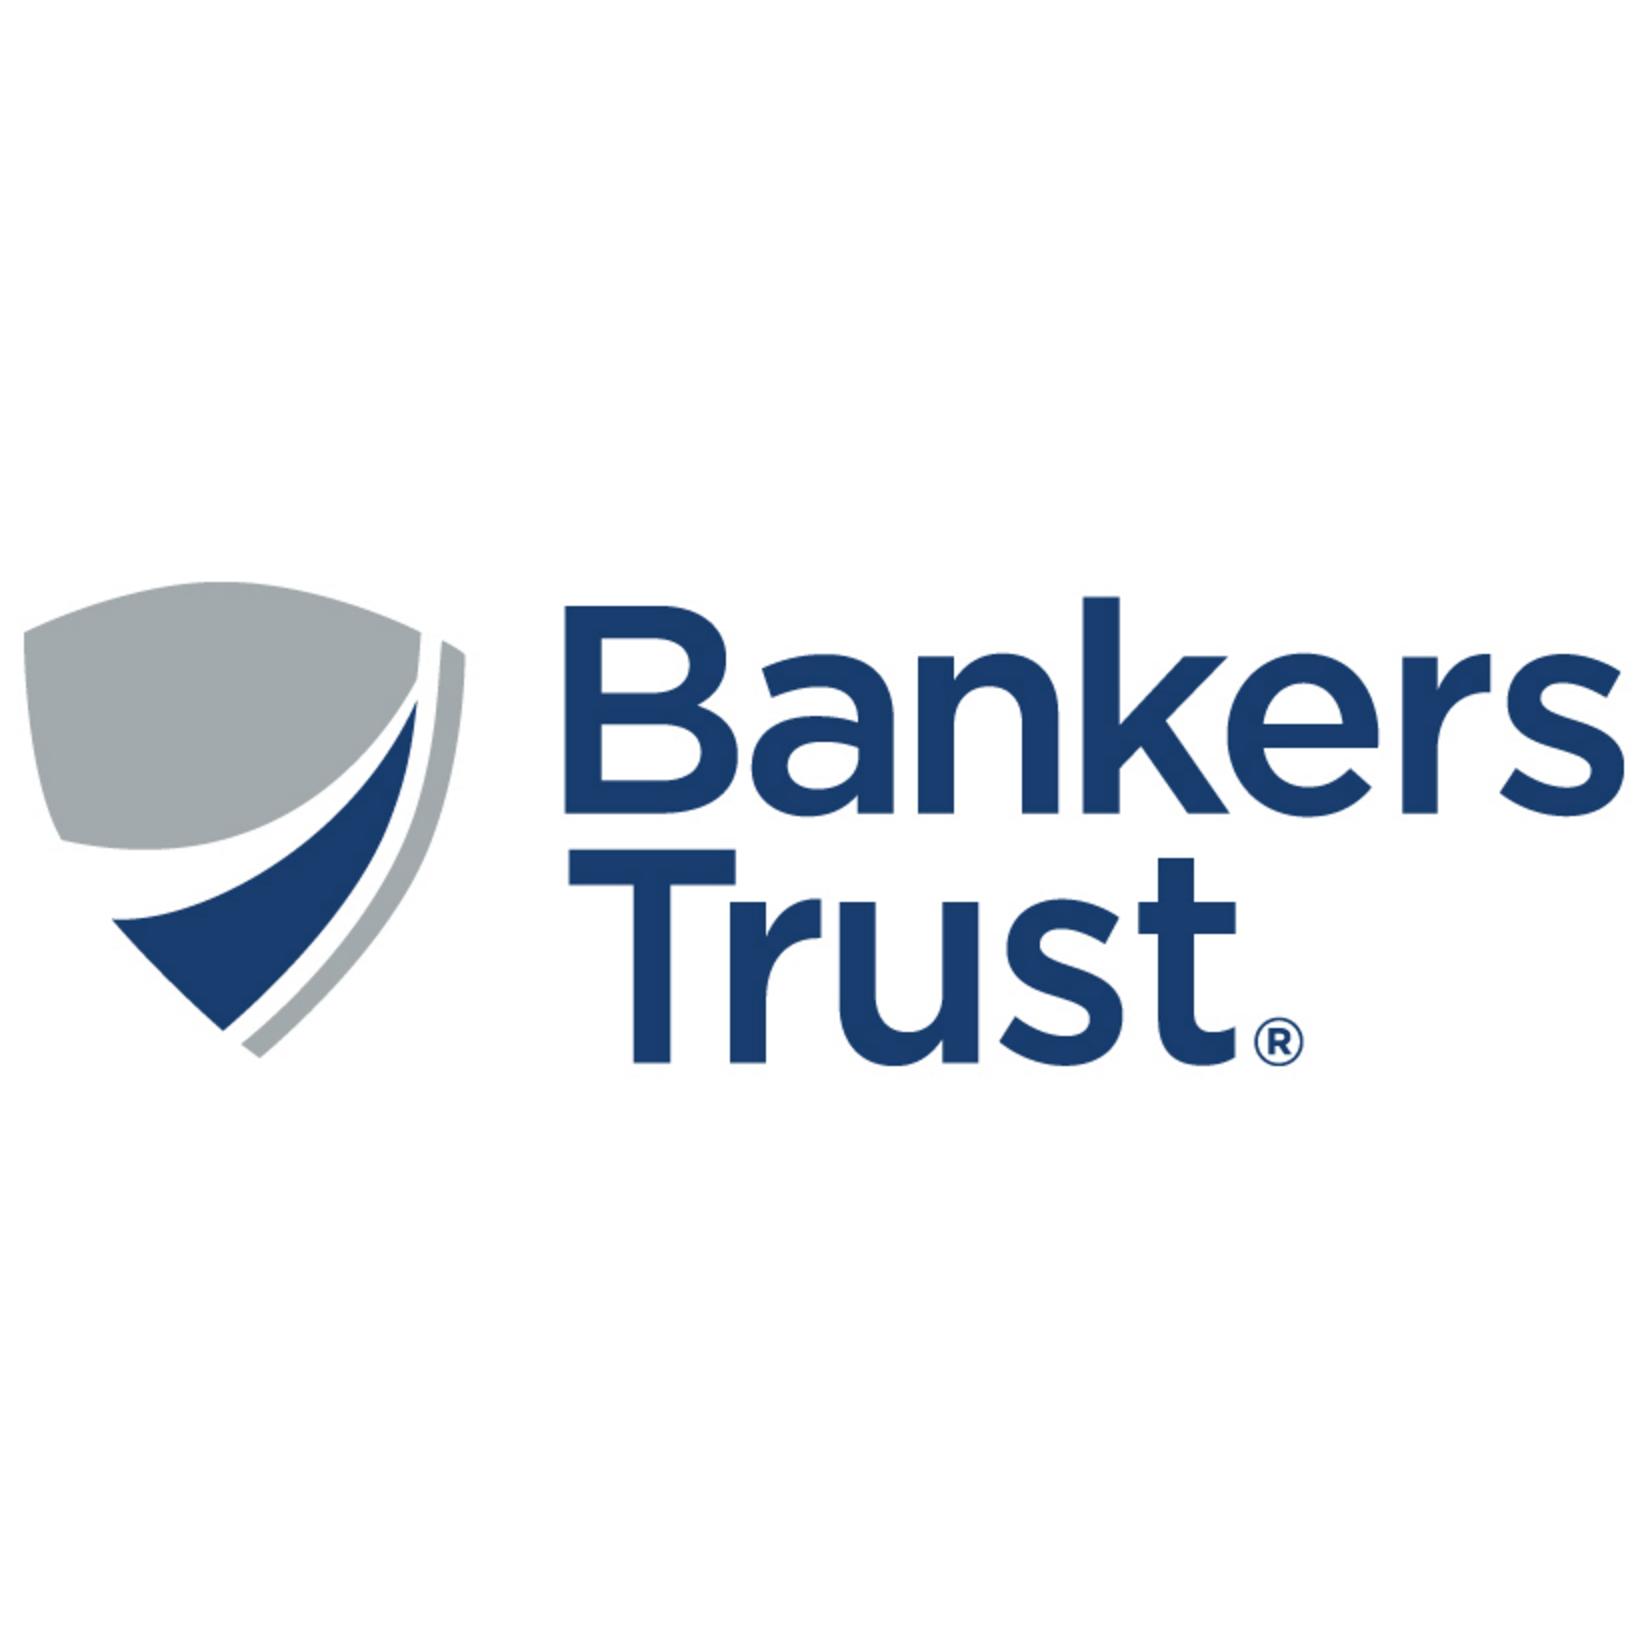 Bankers Trust Logo photo - 1